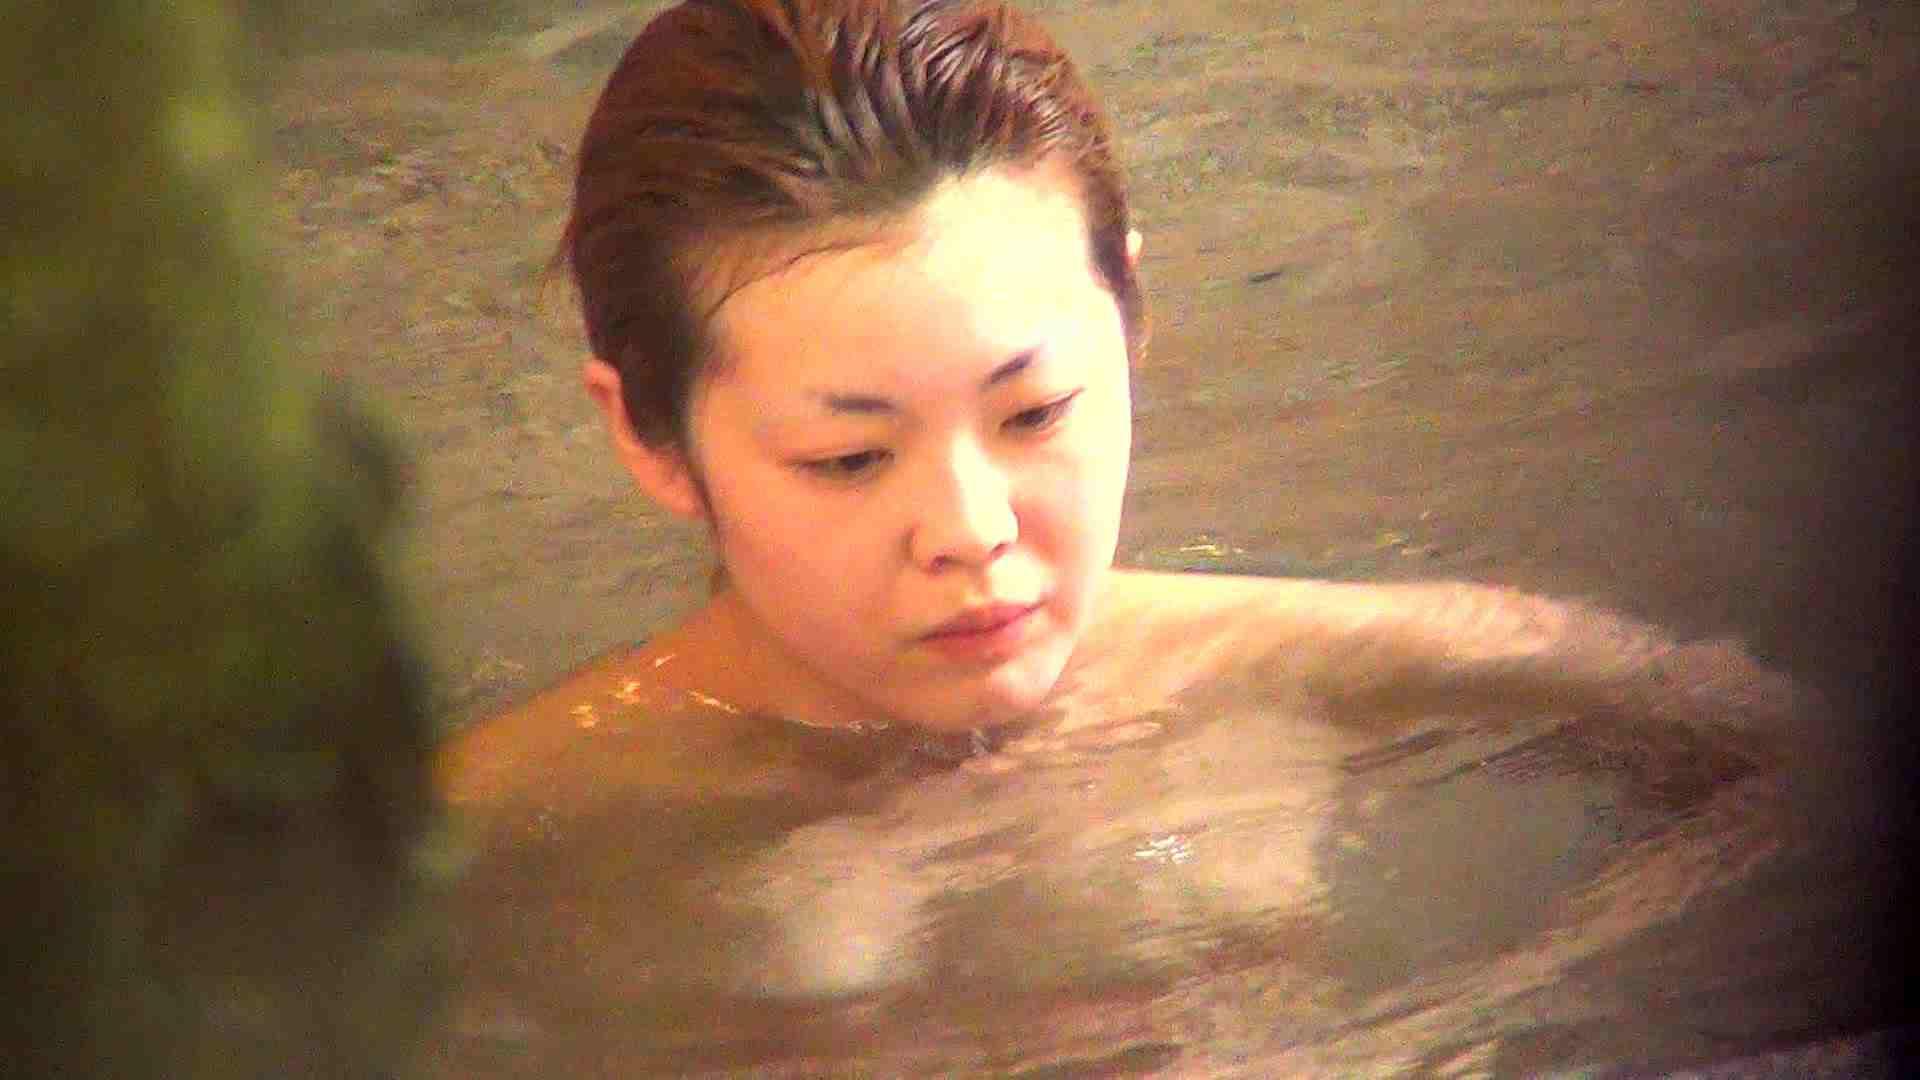 Aquaな露天風呂Vol.288 露天  85連発 83